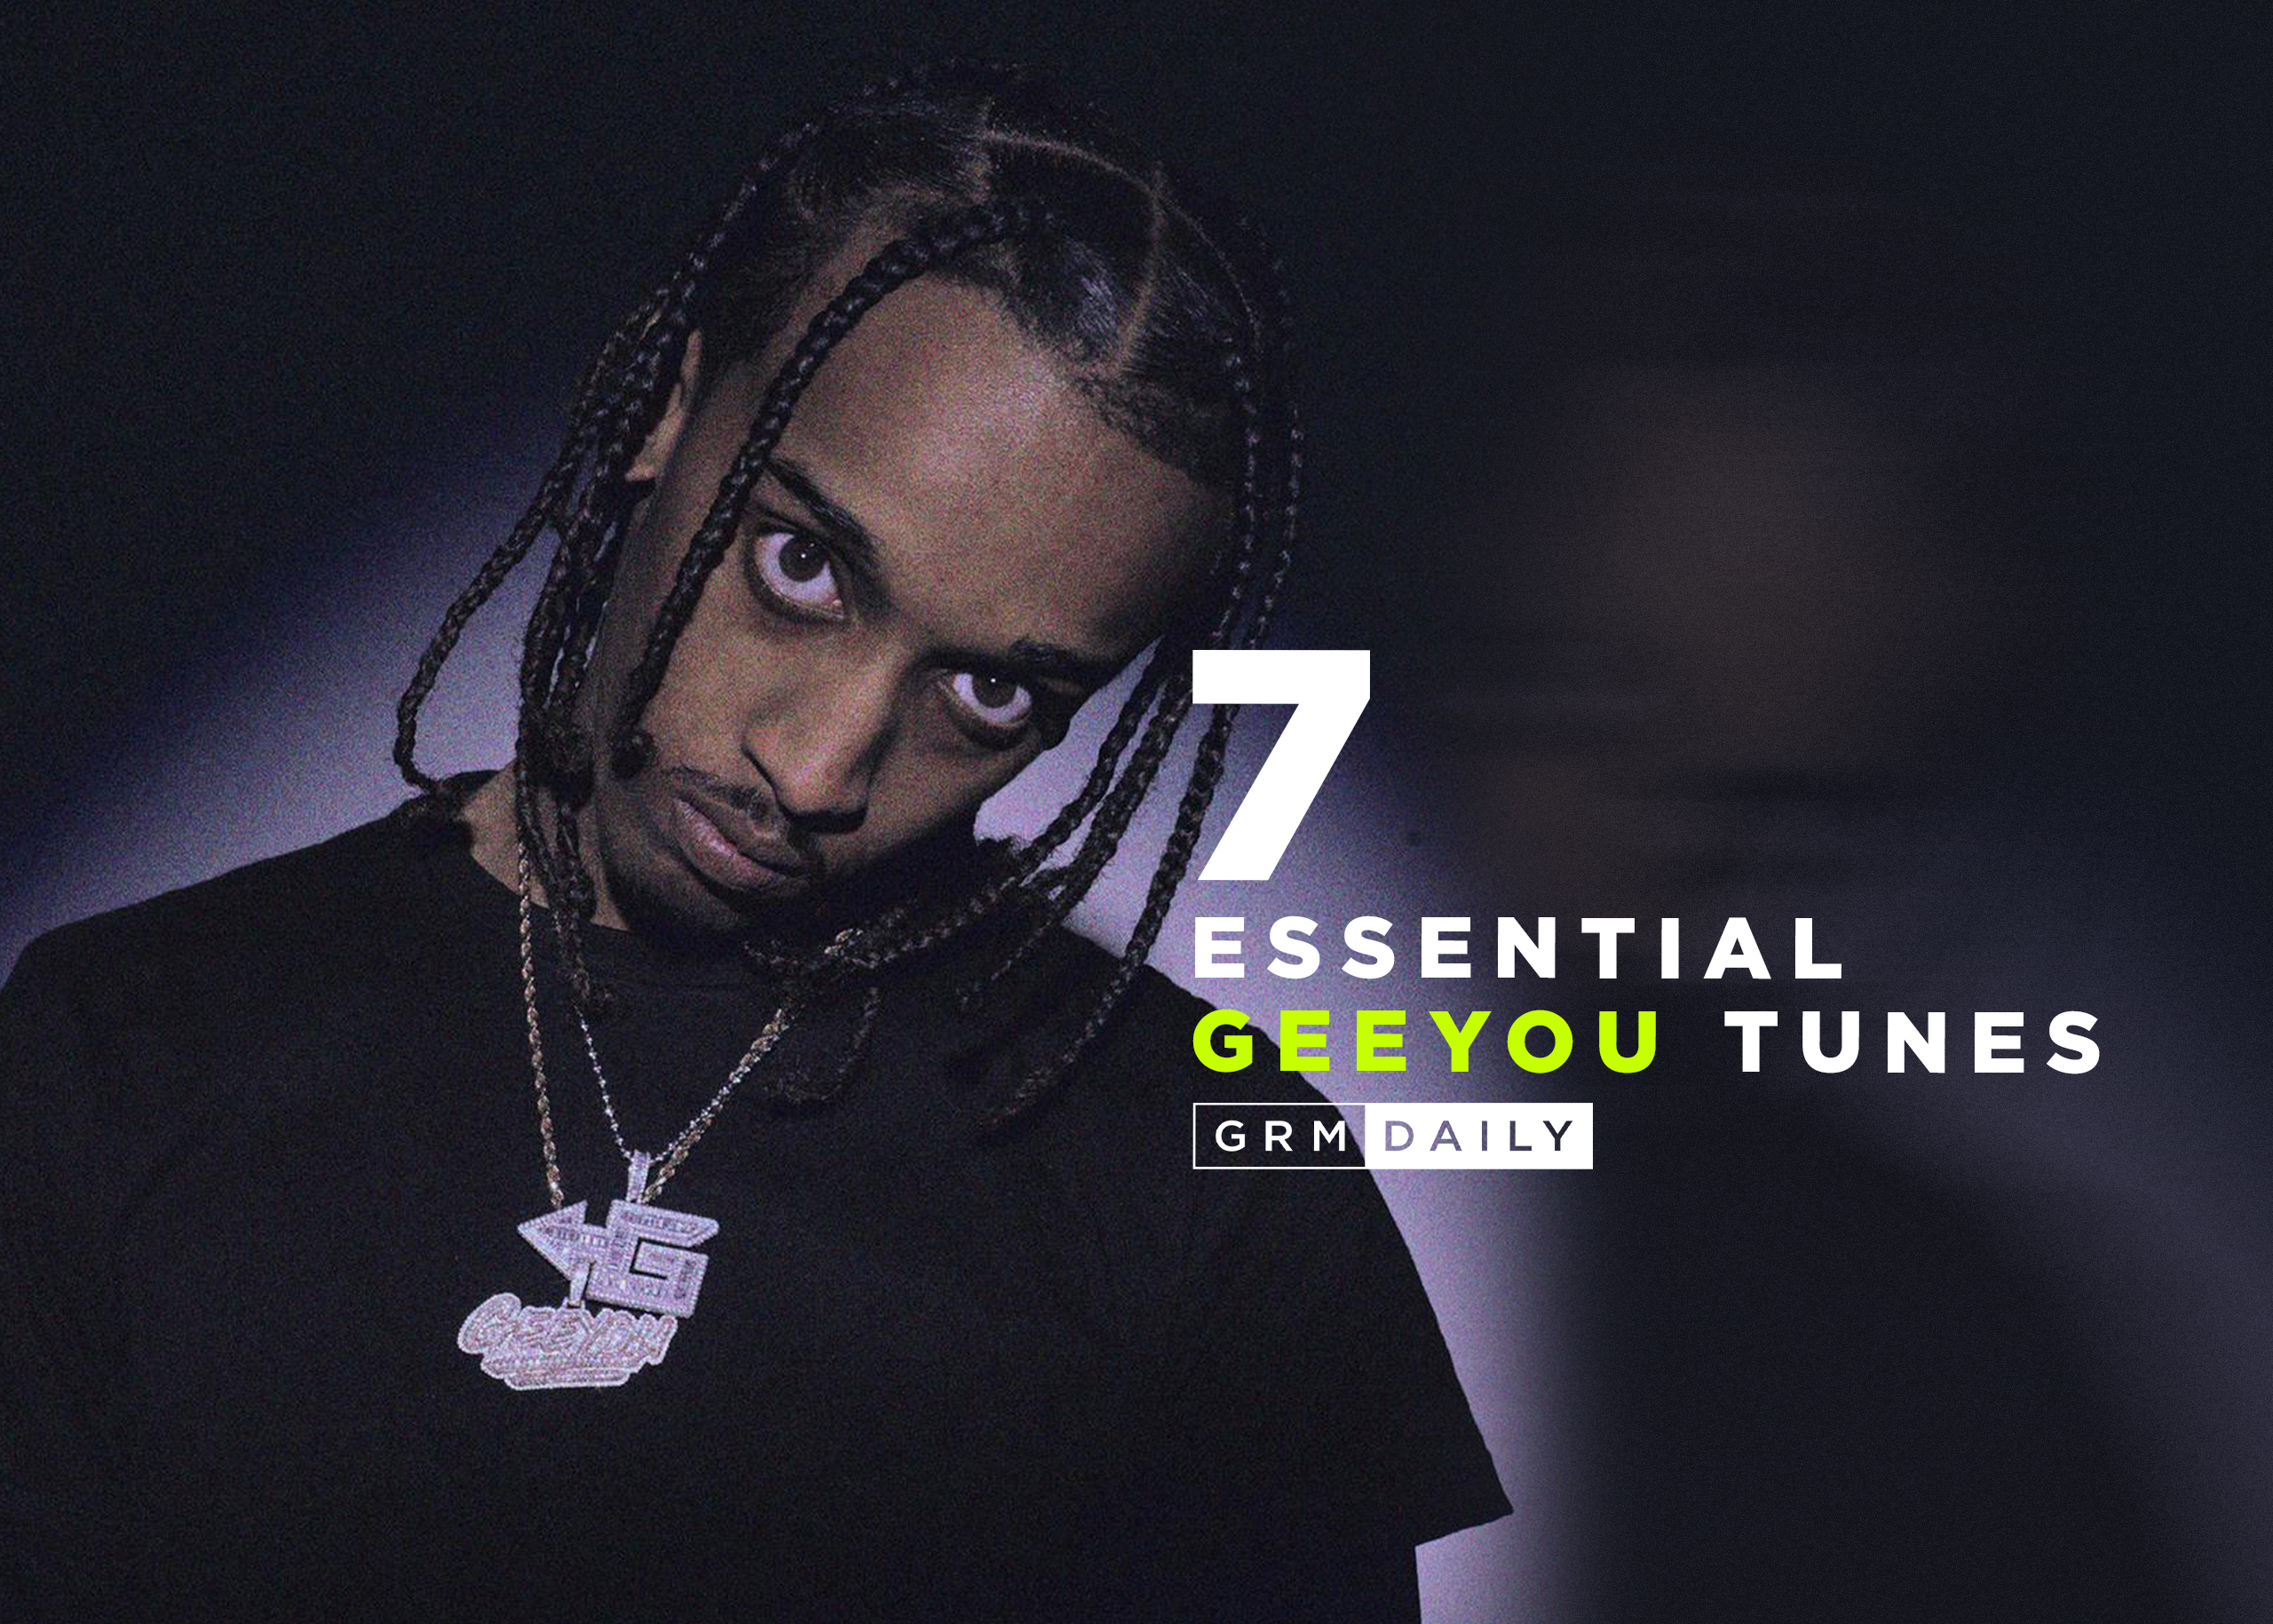 7 essential GeeYou Tunes